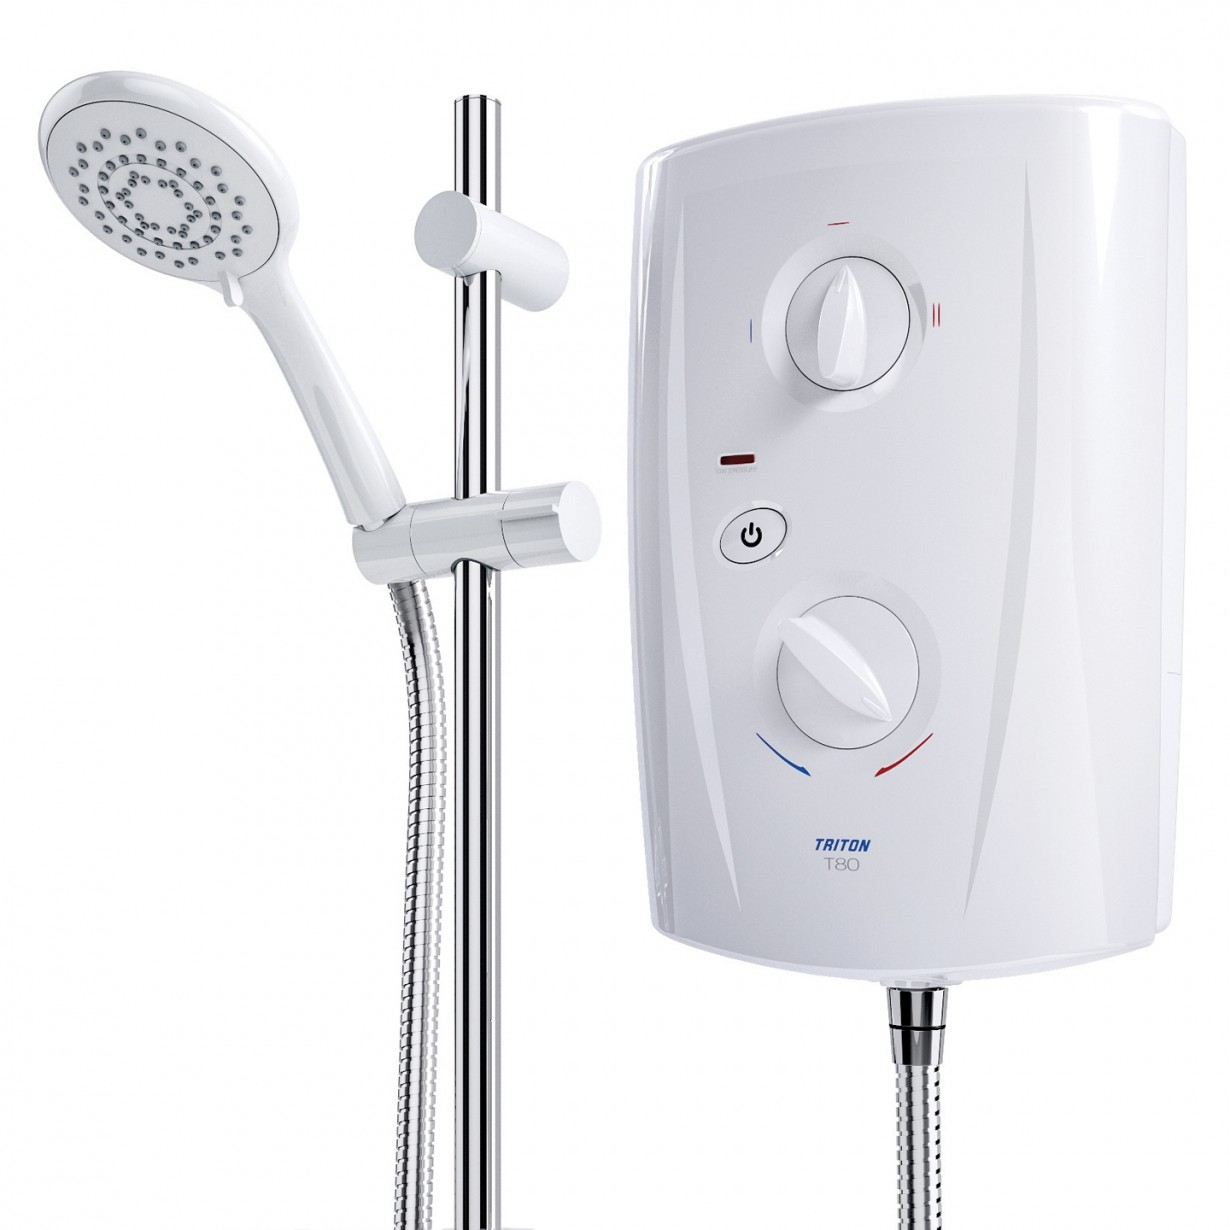 Triton T80 Pro-Fit Eco Electric Shower 8.5KW - White